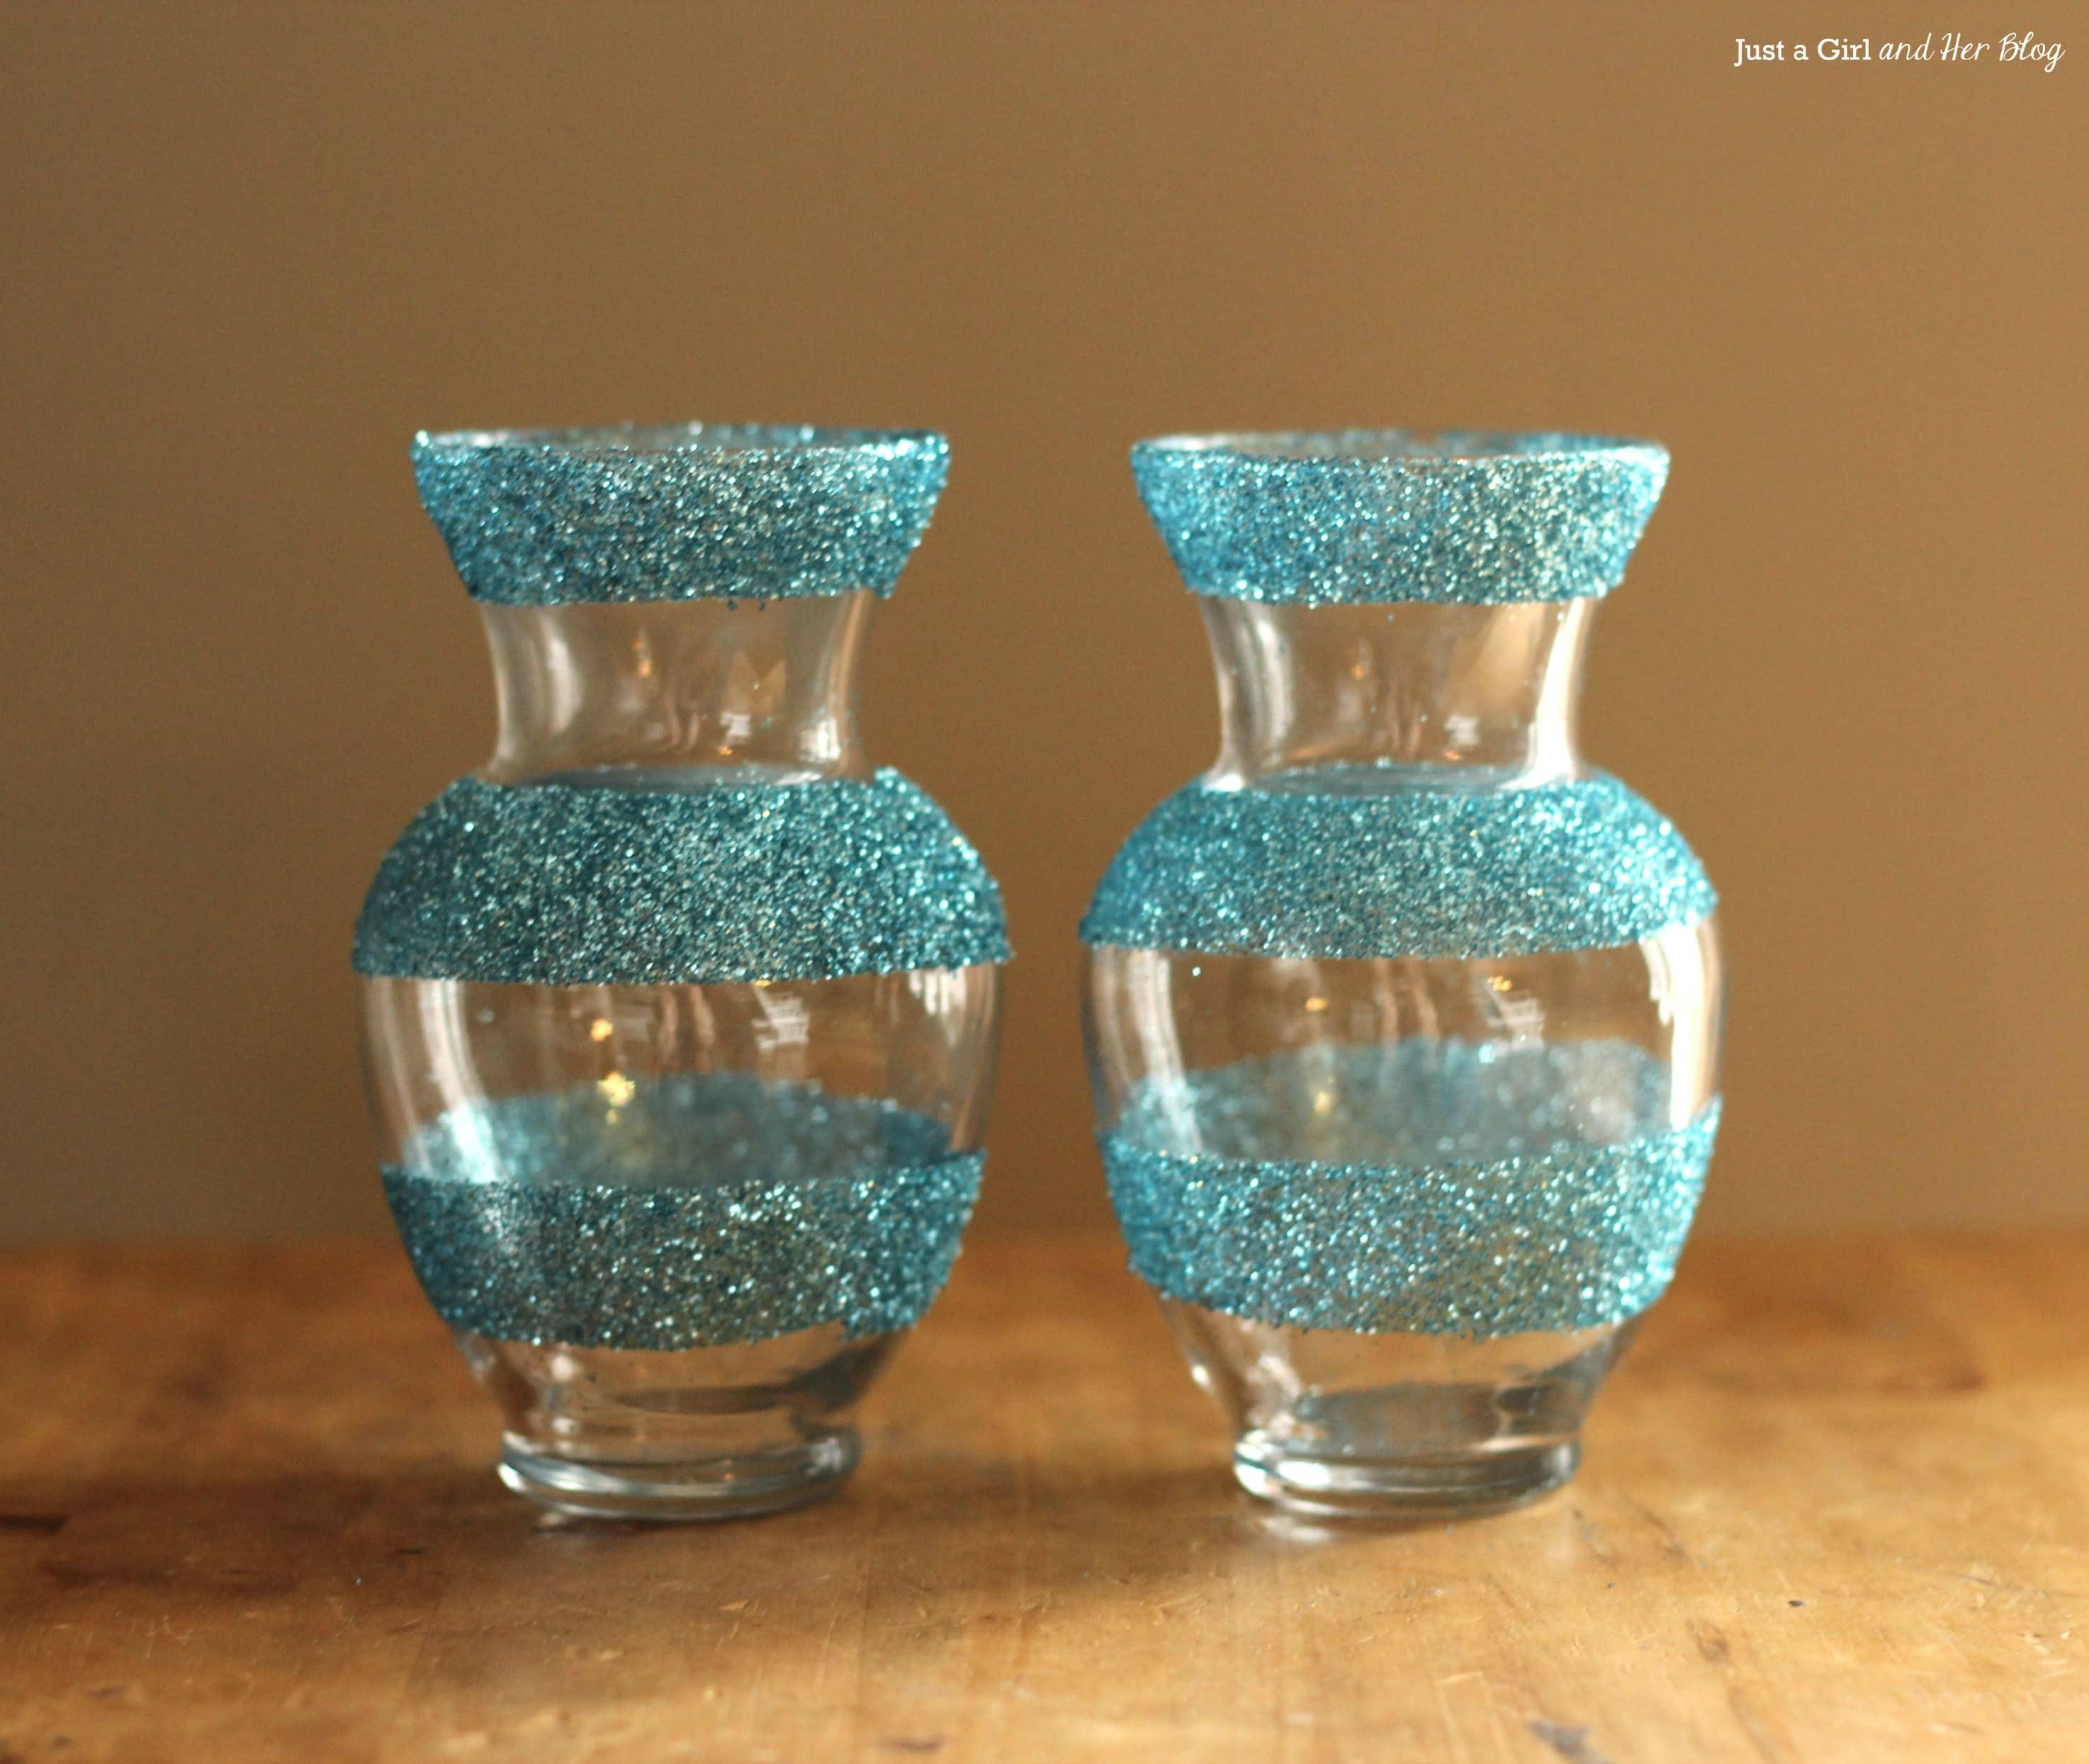 Dollar decor girly glitter vases finished vases reviewsmspy